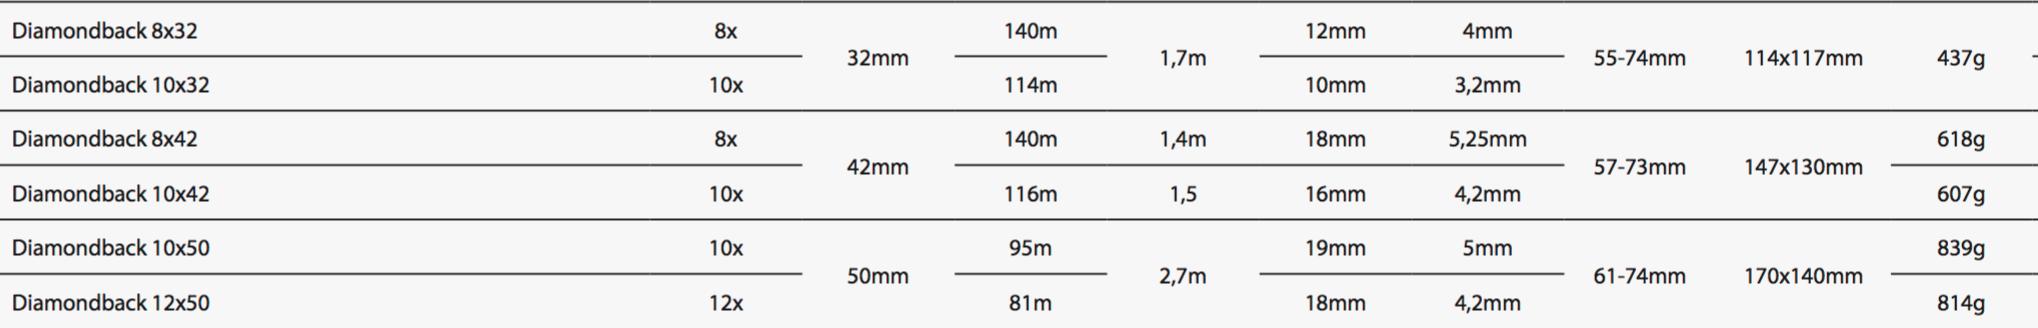 Vortex Optics Diamondbacks II specifikationer håndkikkert til jagt jagtkikkert